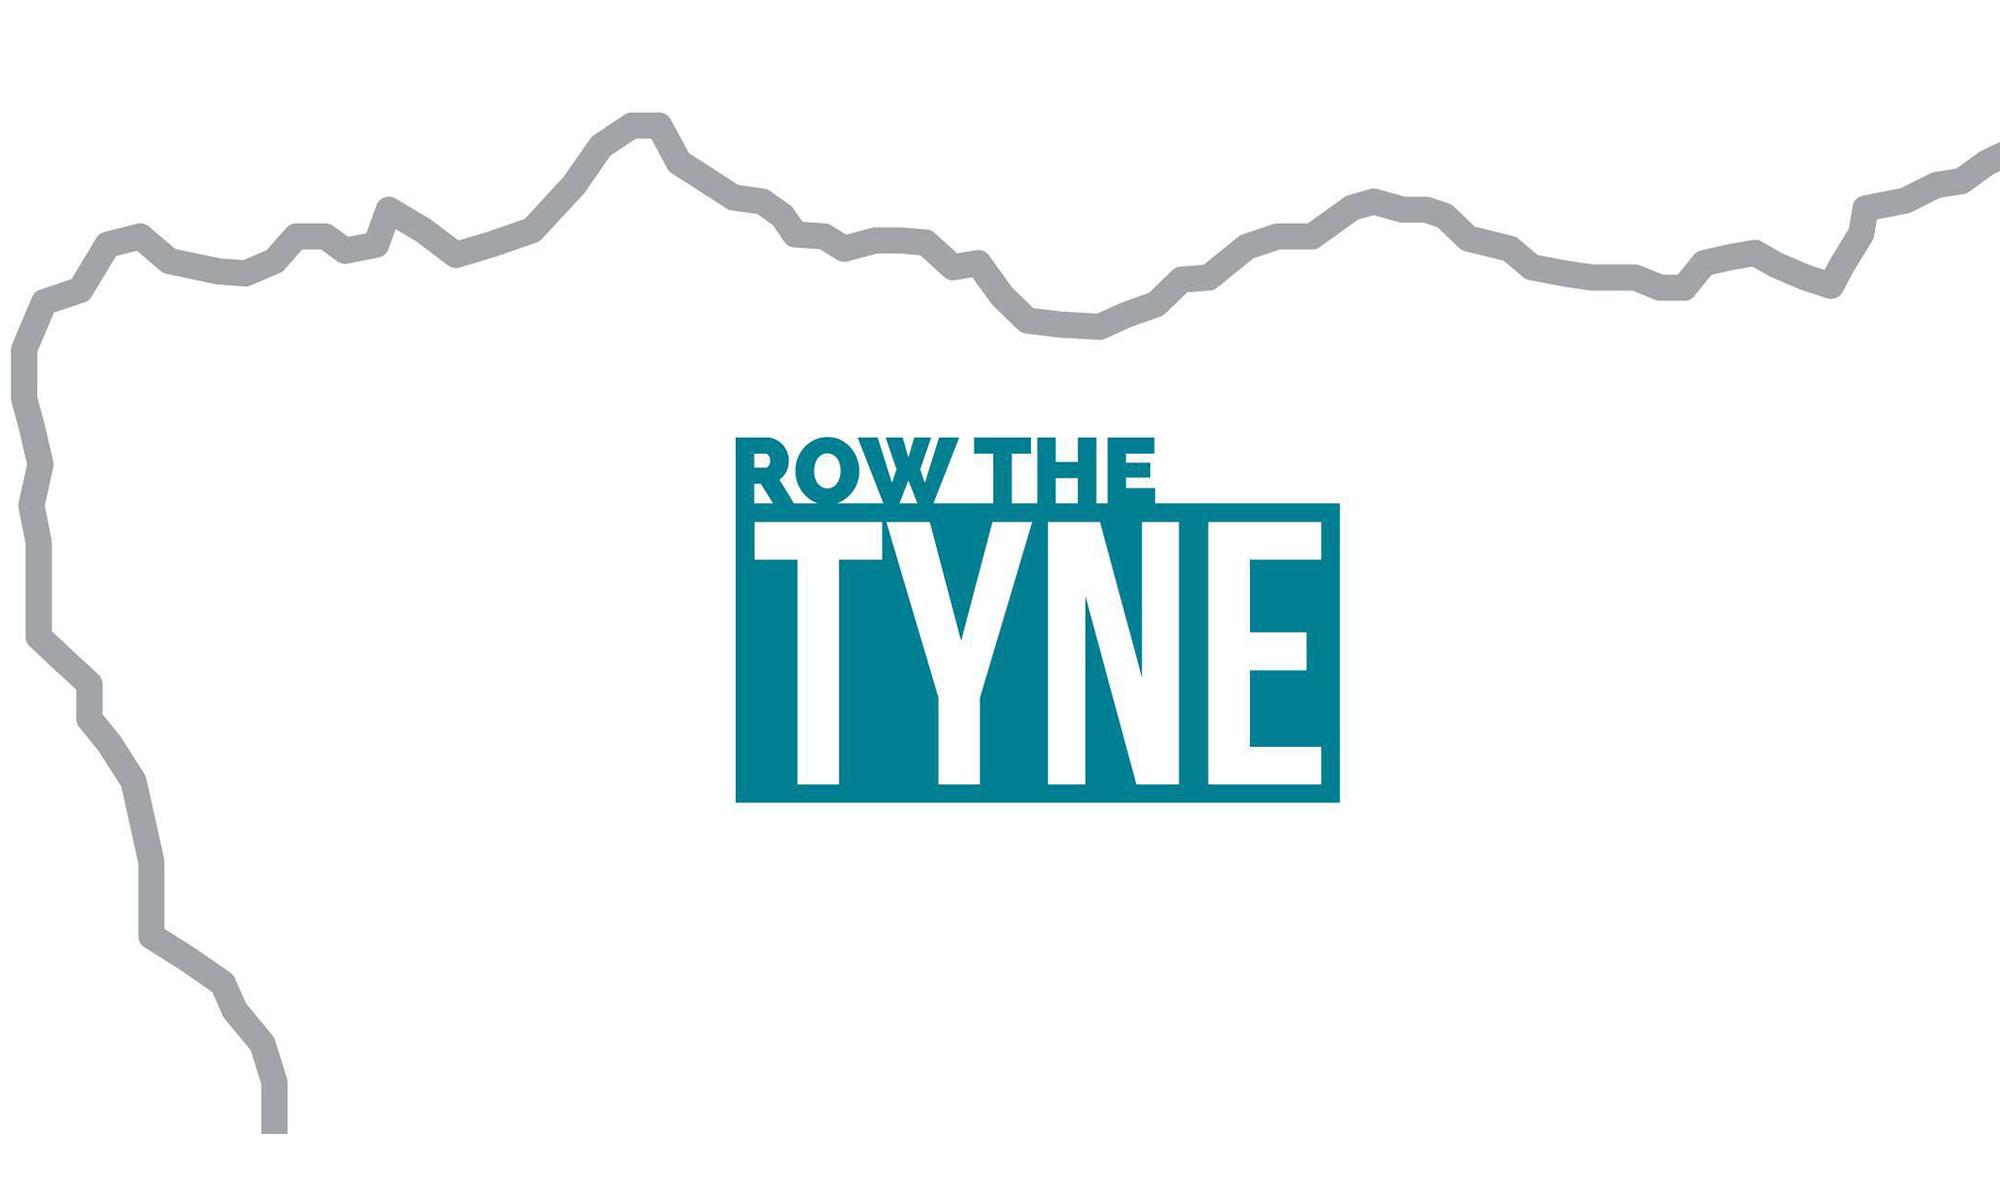 Charity Row The Tyne Event